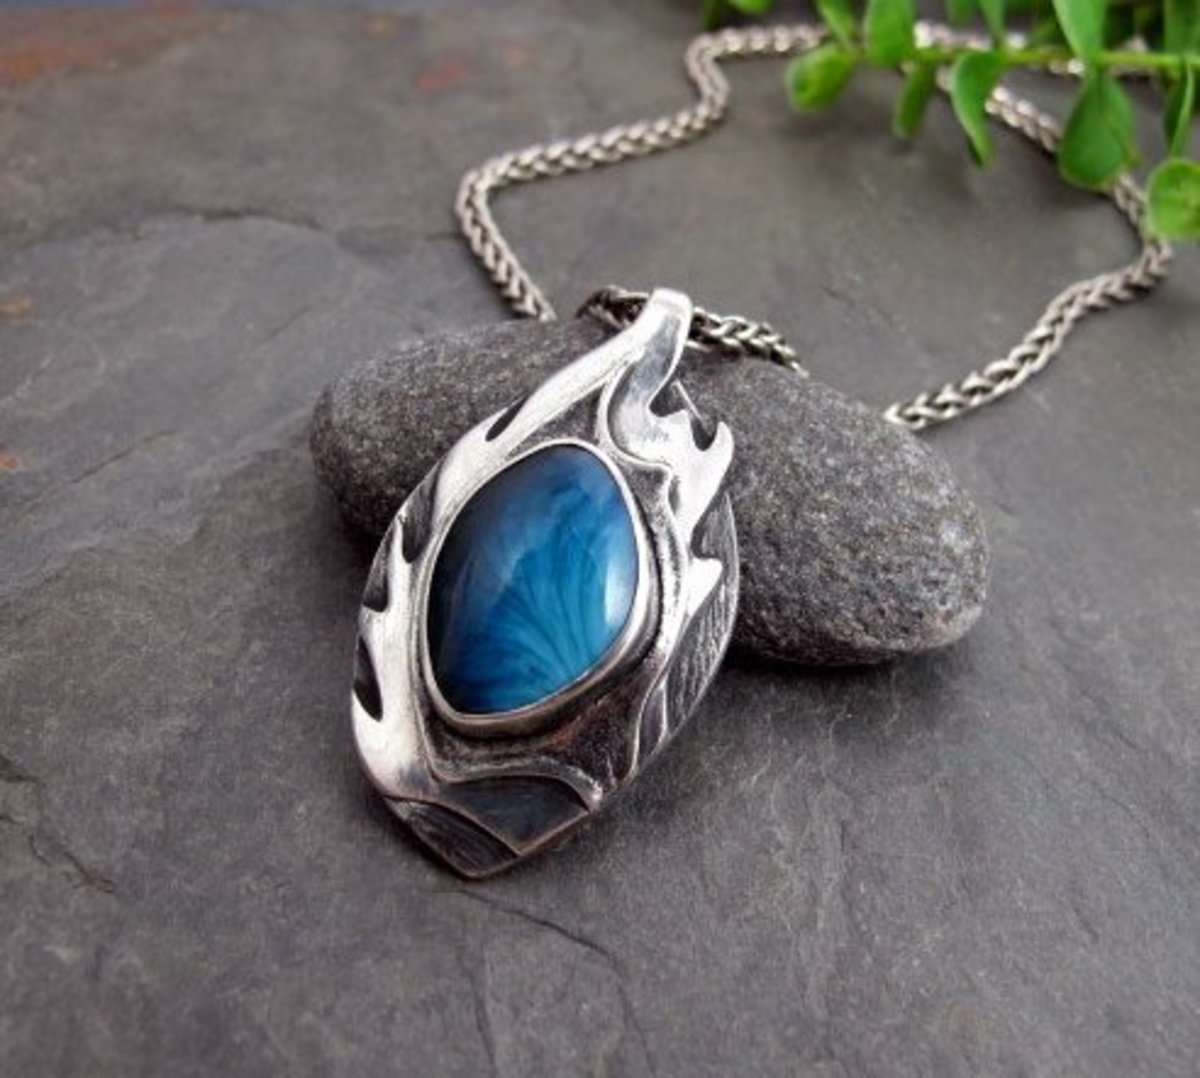 Bezel set Swedish Blue stone silver pendant